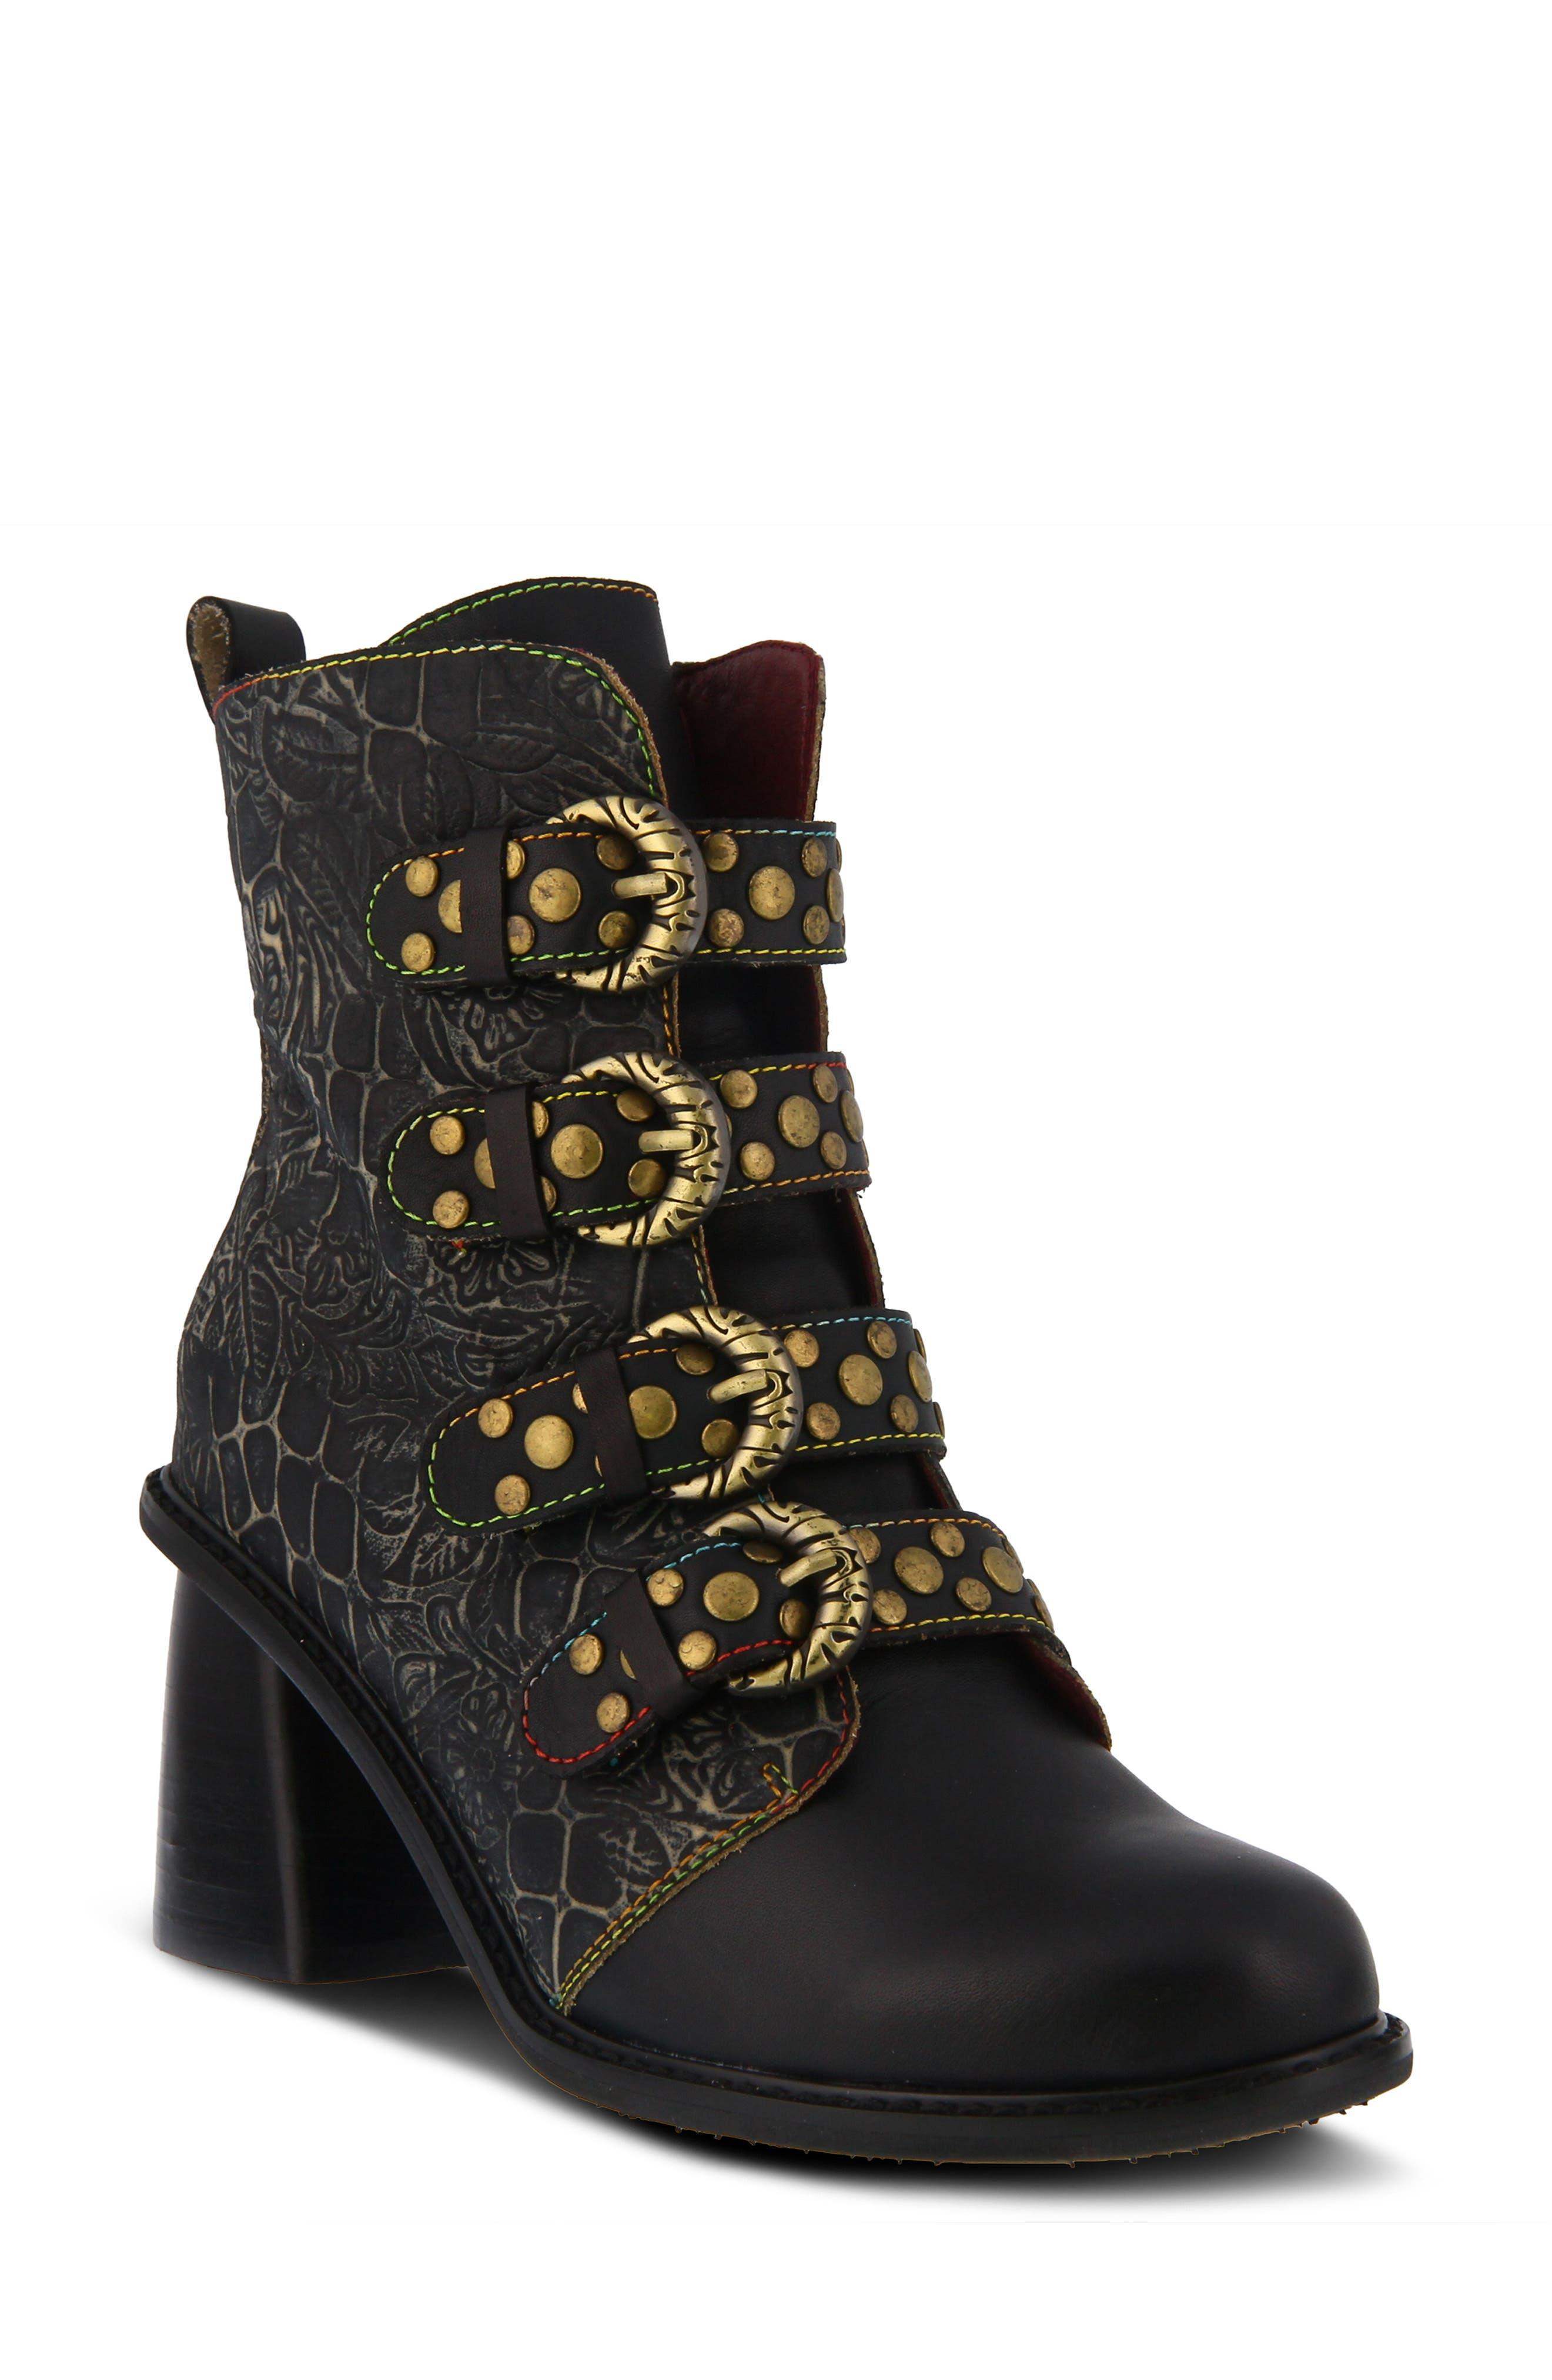 Vintage Boots- Buy Winter Retro Boots Womens LArtiste Wonderland Bootie Size 9US  40EU - Black $159.95 AT vintagedancer.com